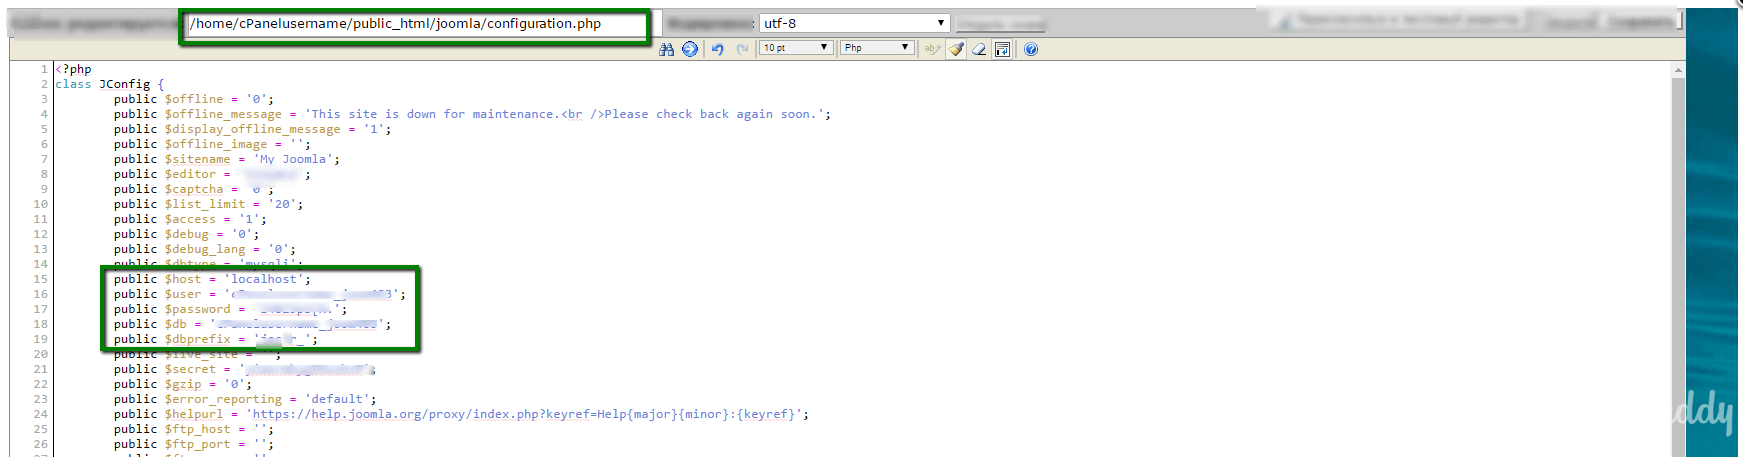 Joomla Configuration